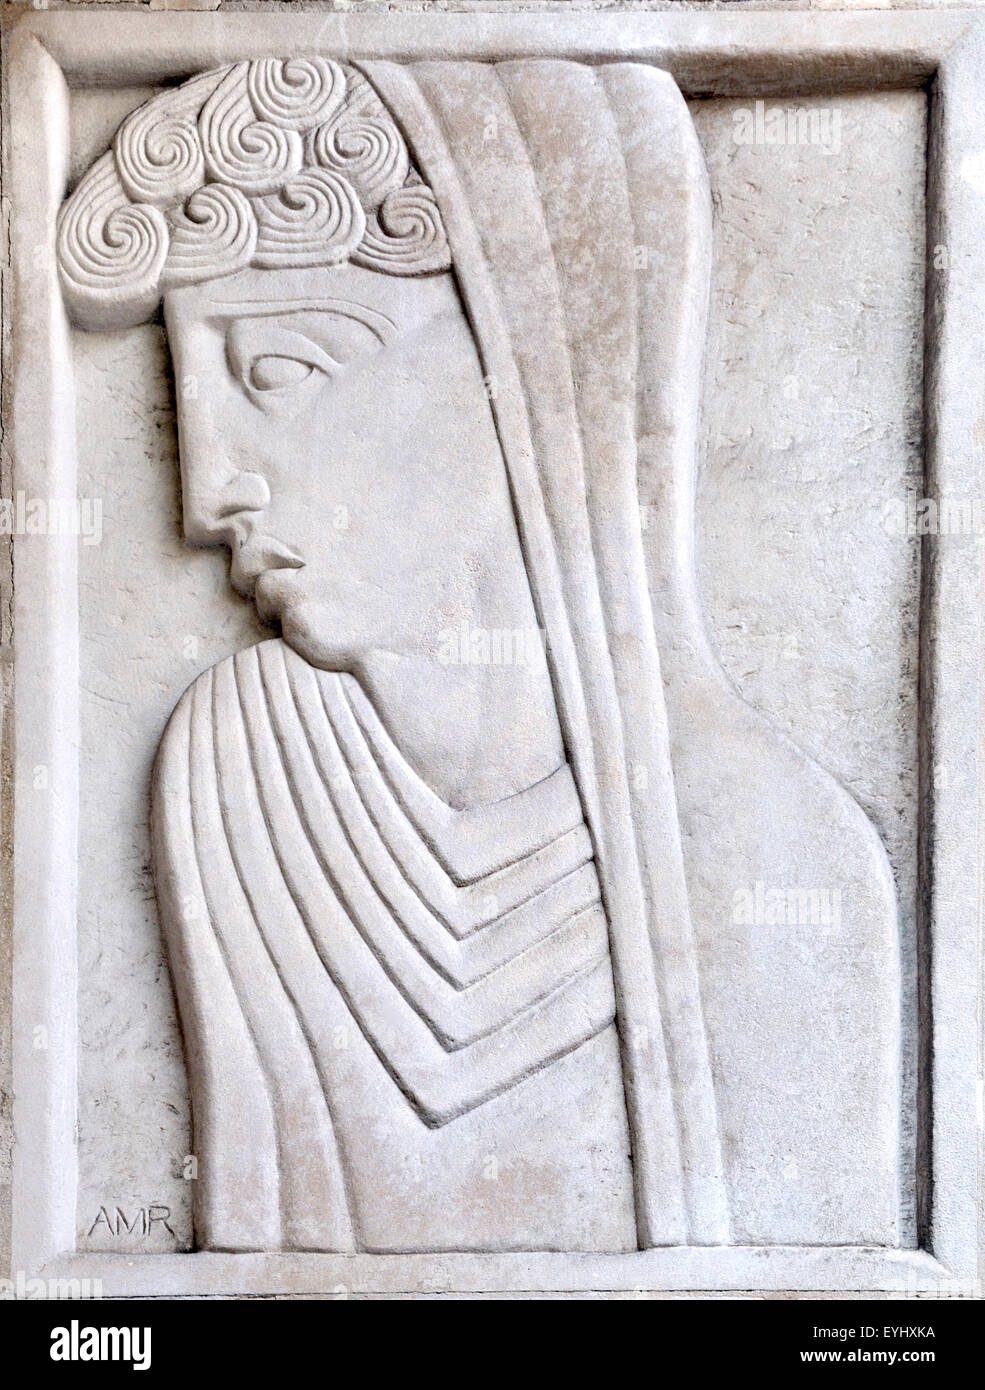 London, England, UK. St Martin's School of Art, Charing Cross Rd.  Carved stone panel by Adolfine Ryland: Renaissance - Stock Image